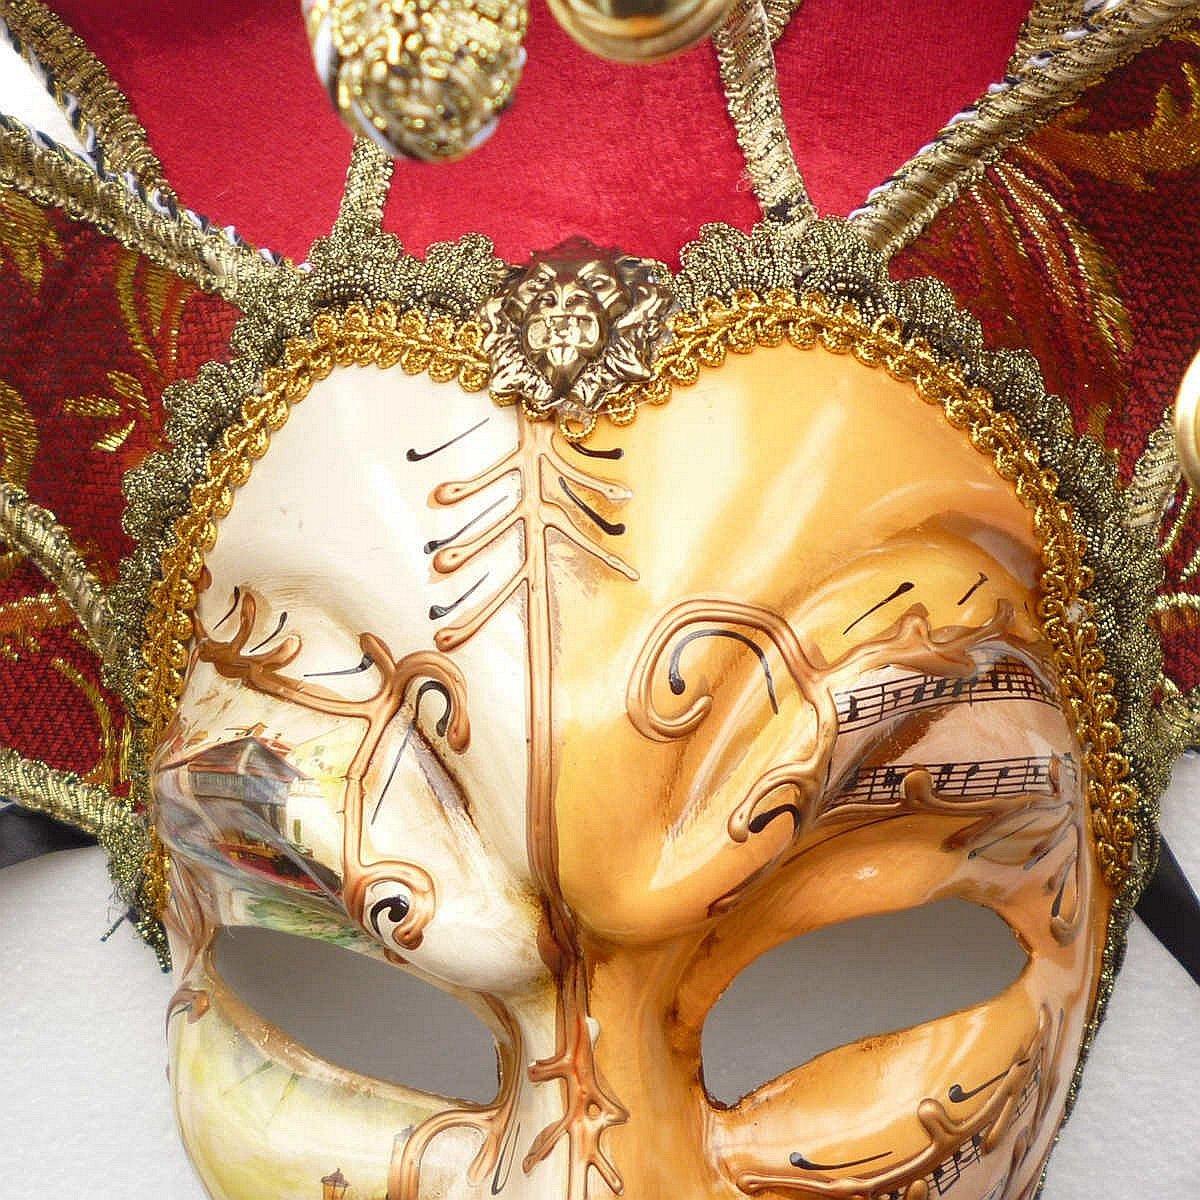 Amazon.com: ZjpMask Full Face Venetian Jester Mask Masquerade Mardi ...